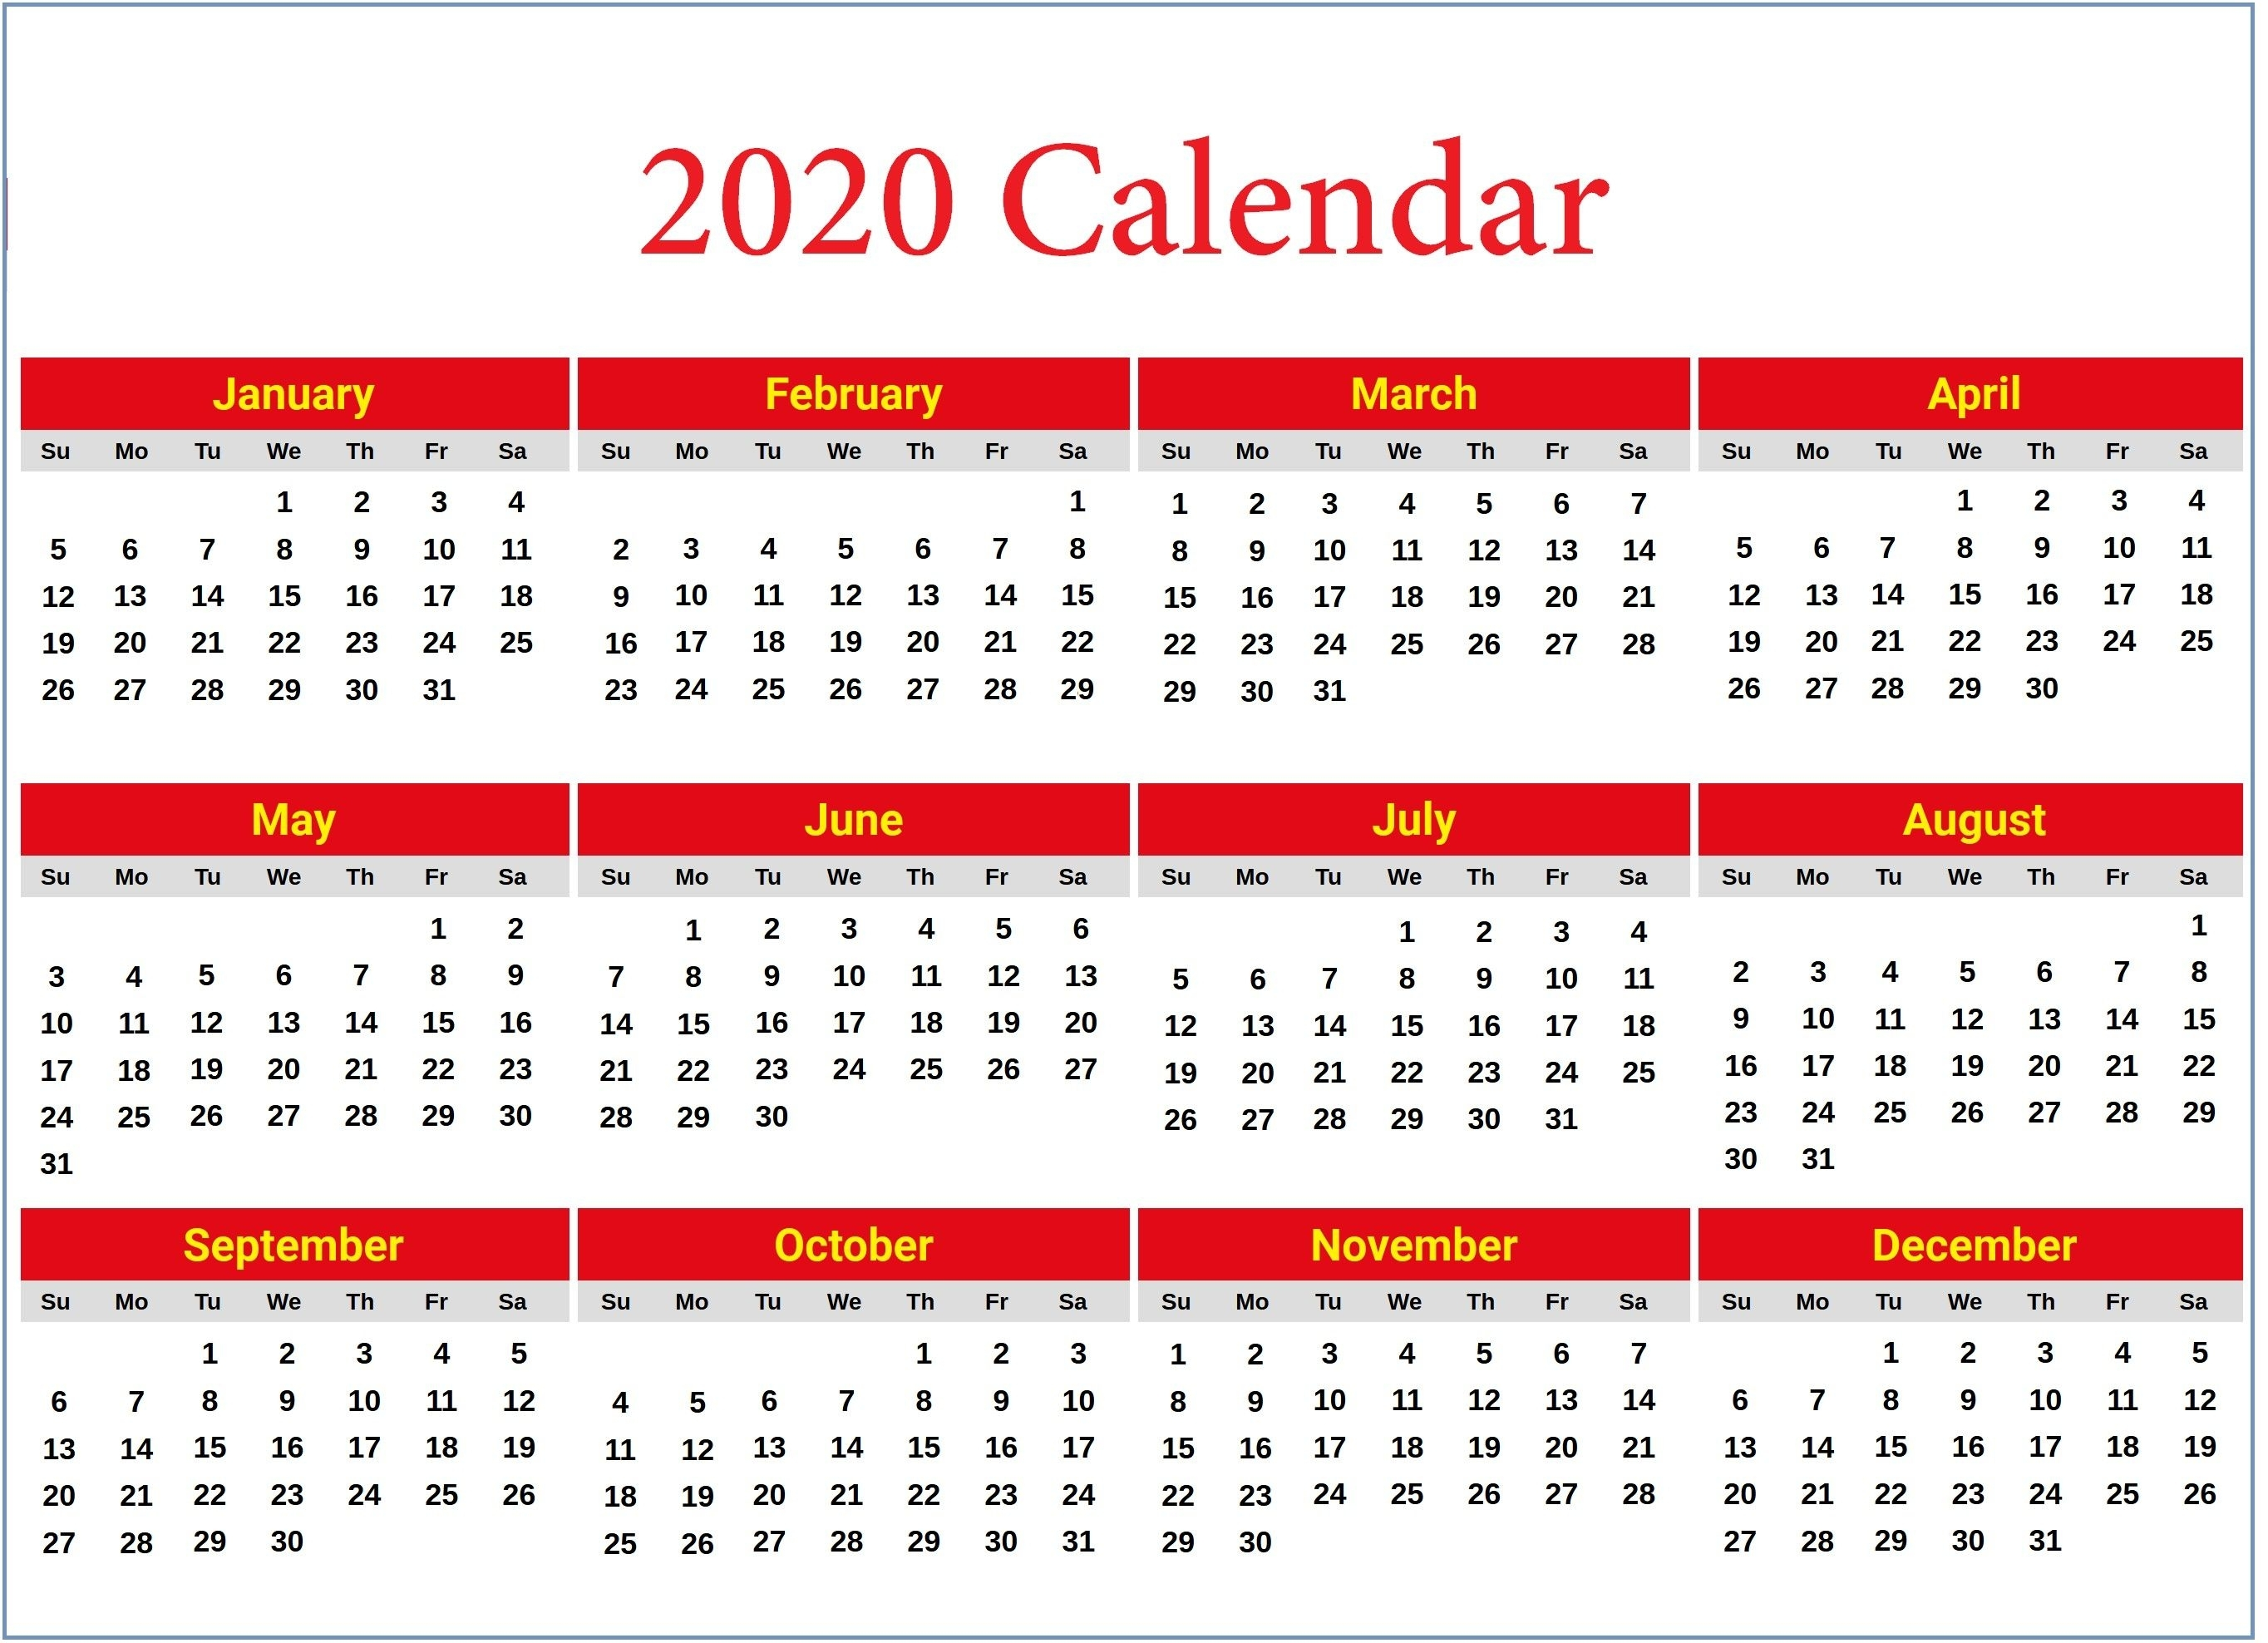 Calendar 2020 Printable With Holidays Di 2020